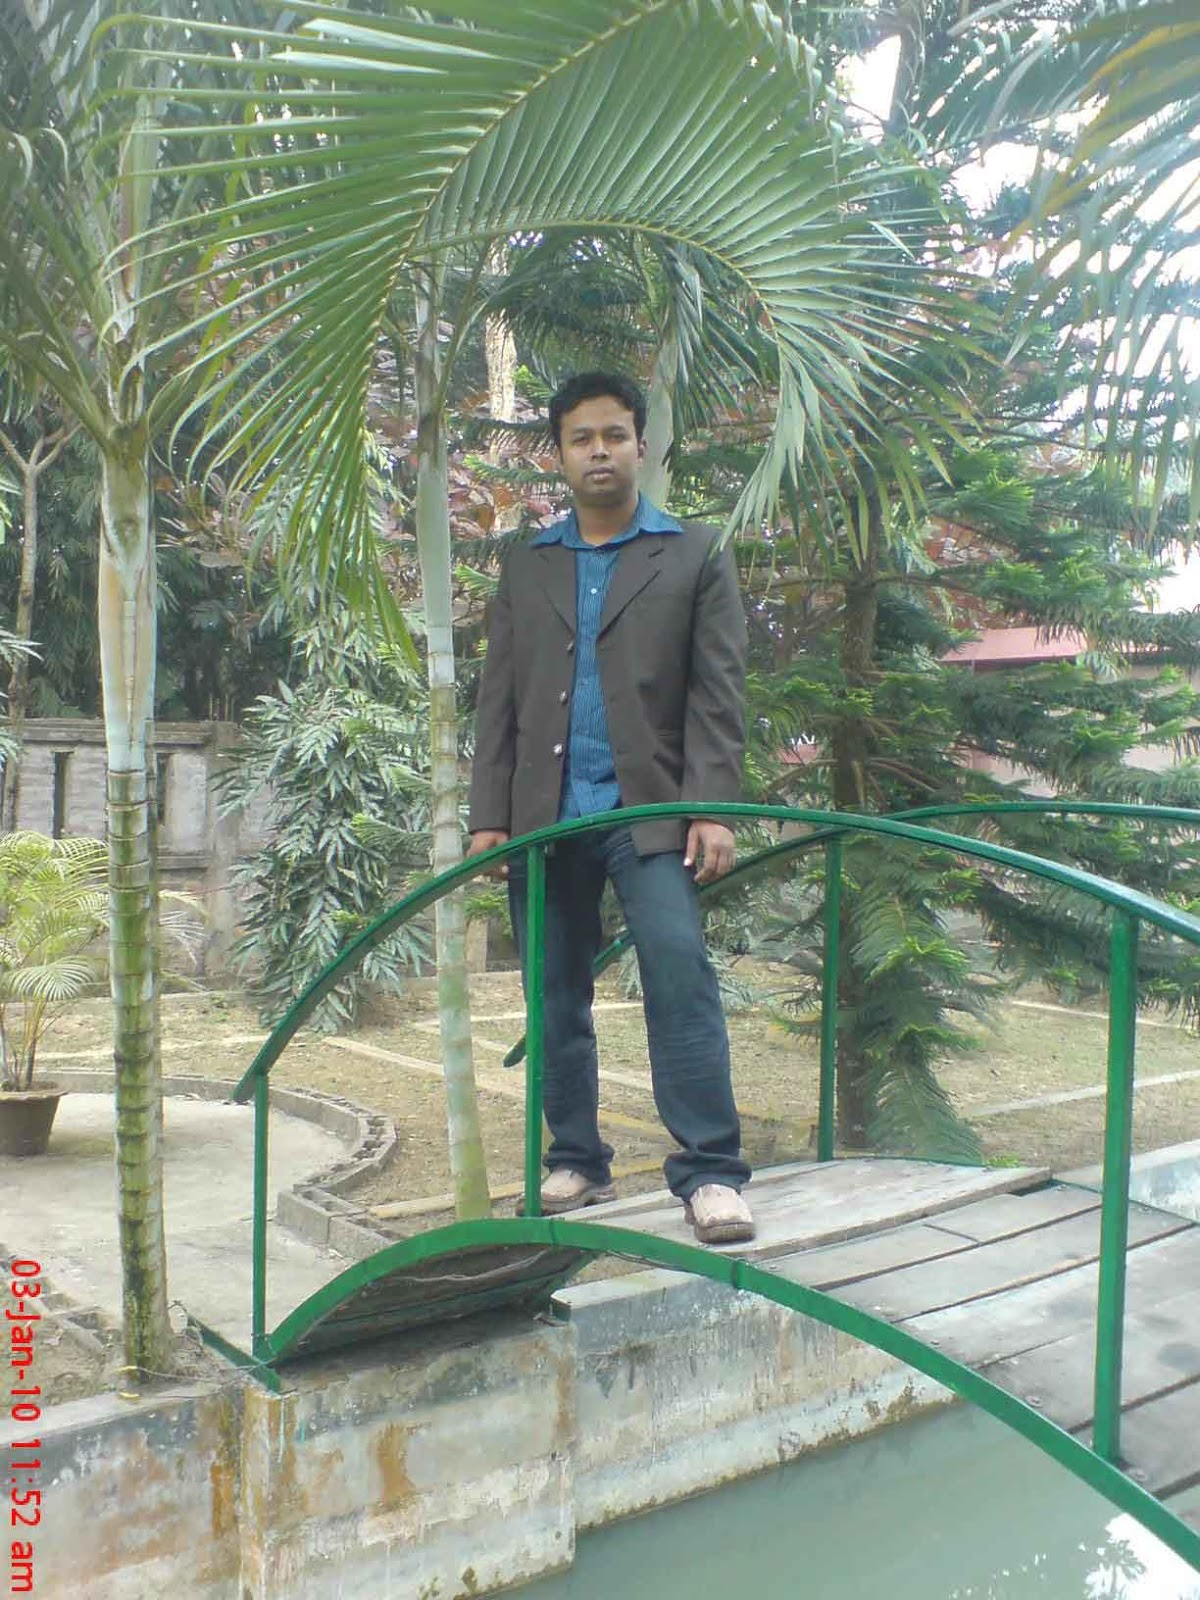 http://1.bp.blogspot.com/_NYwsYcoPB3M/TRSa83g0dcI/AAAAAAAAADI/pOCaR8PyDvA/s1600/DSC00459.jpg